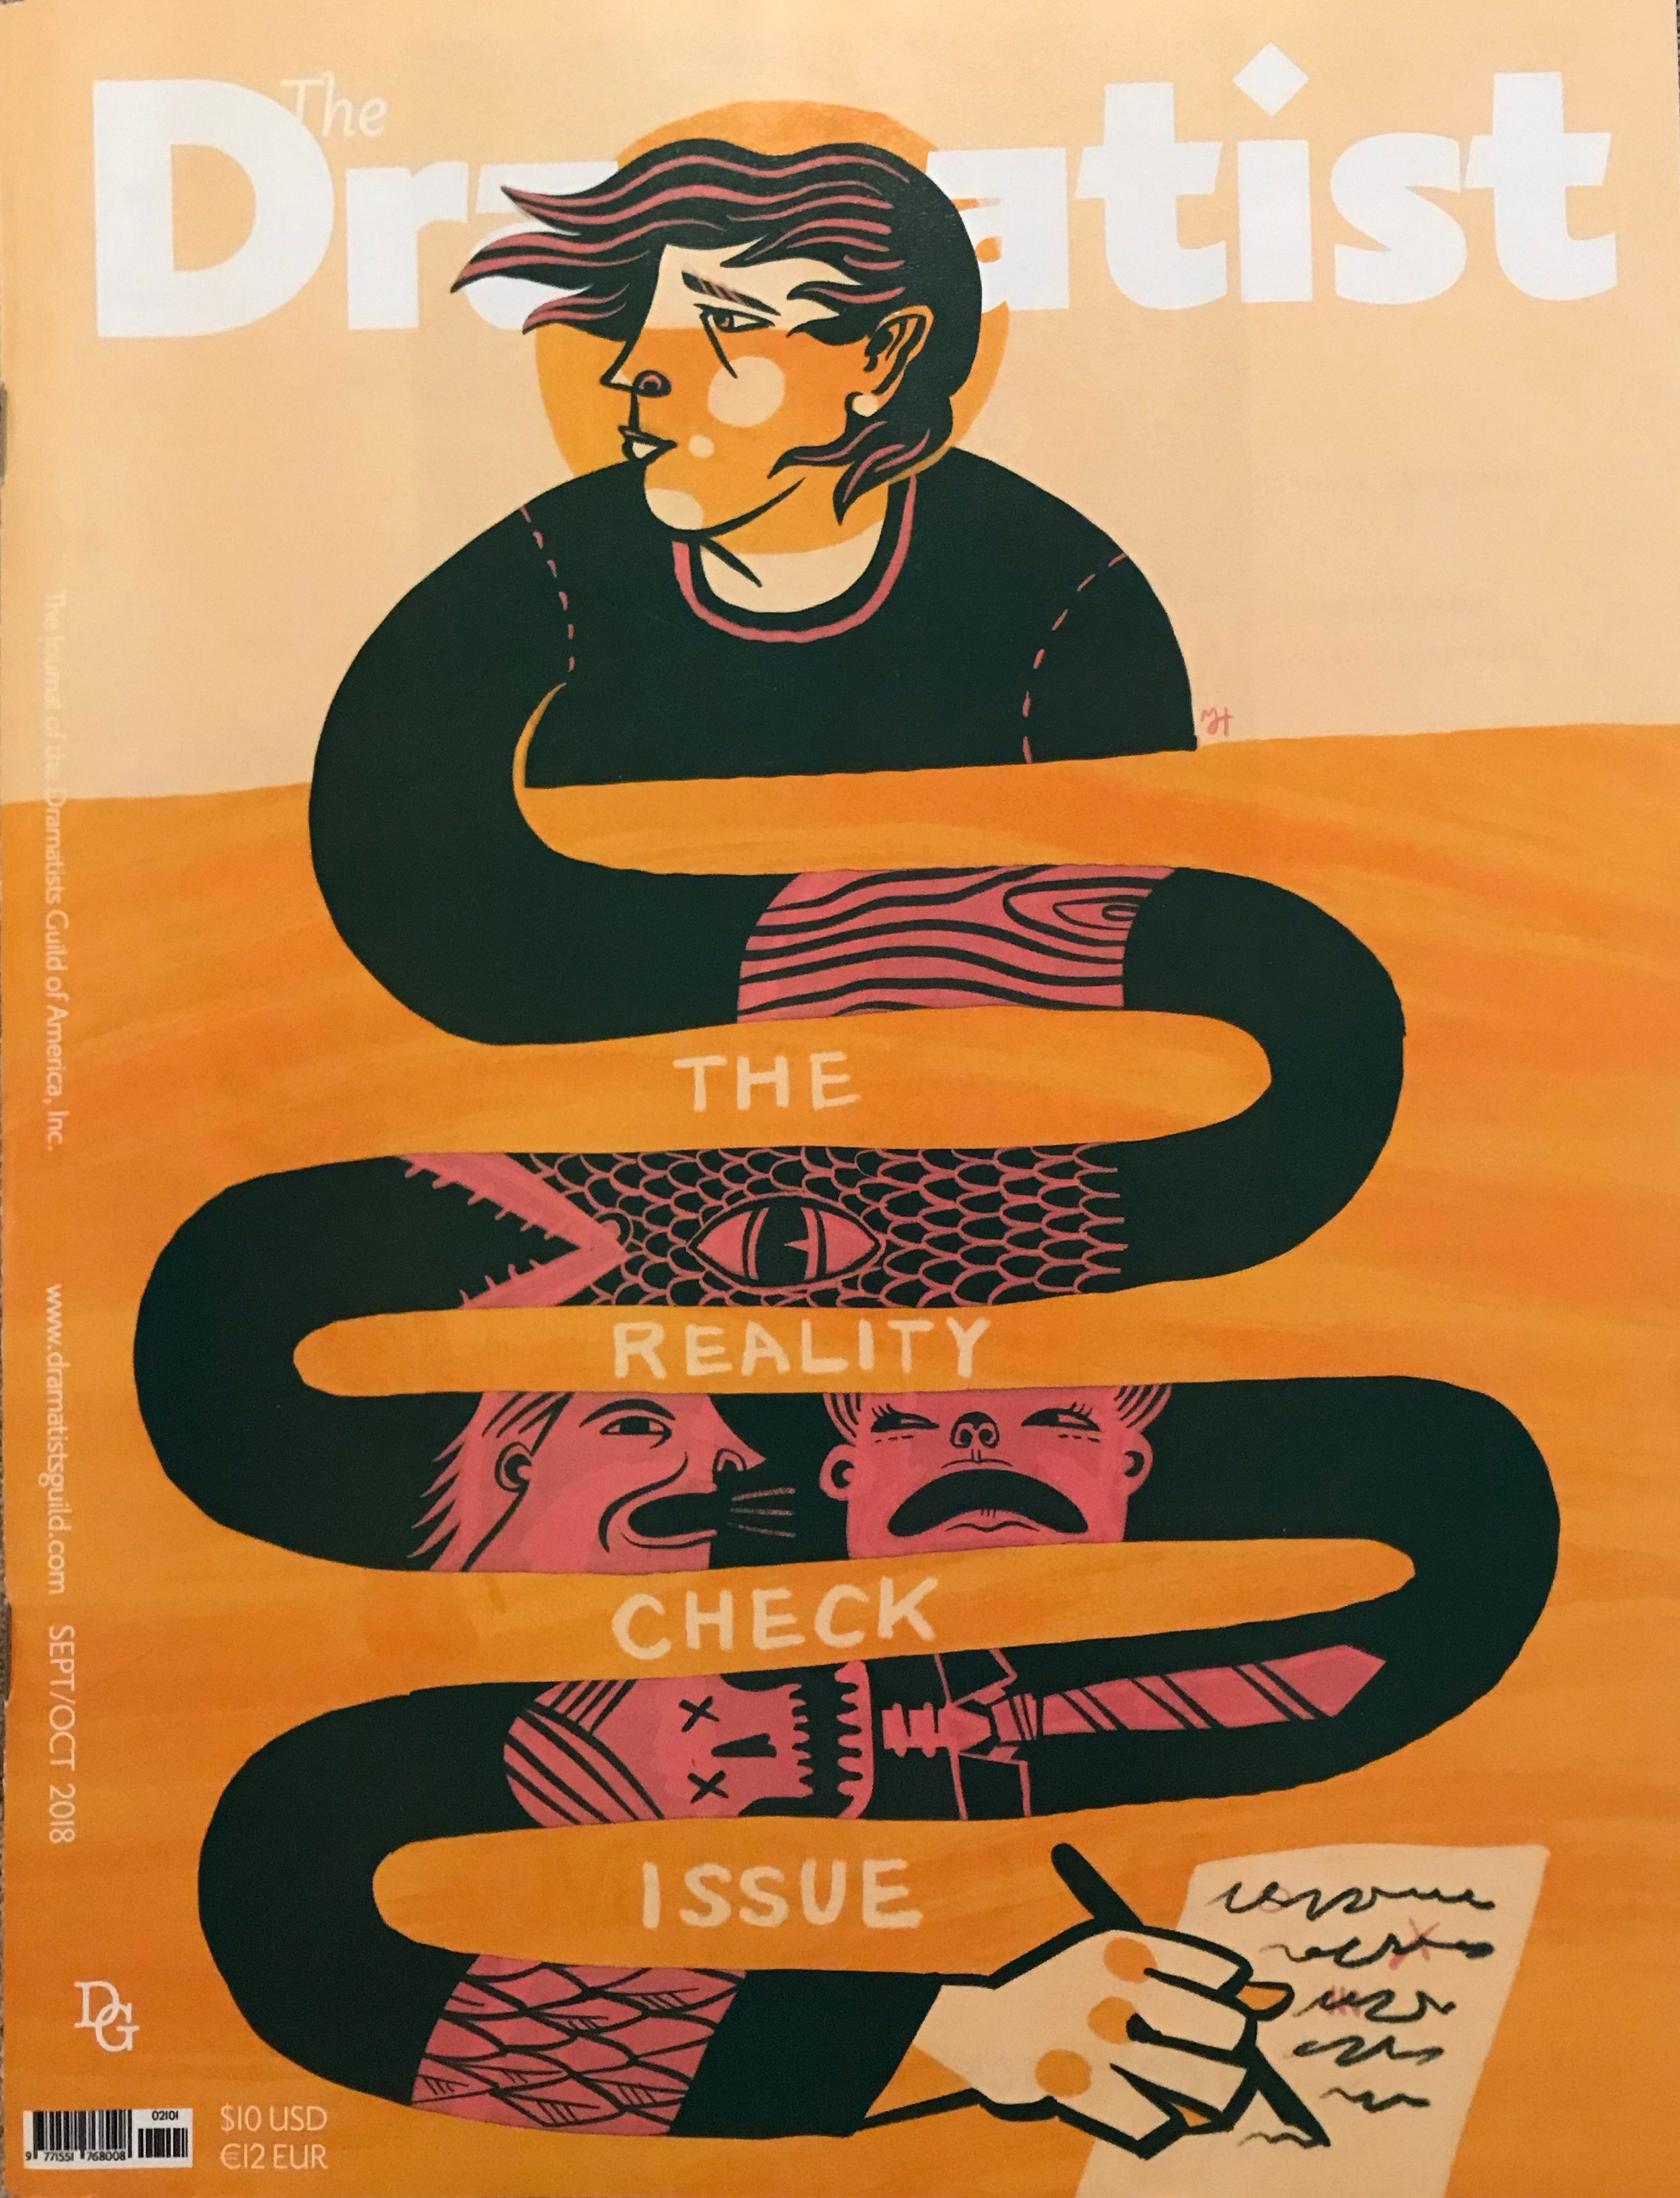 Dramatist Cover 2018 revised.jpg